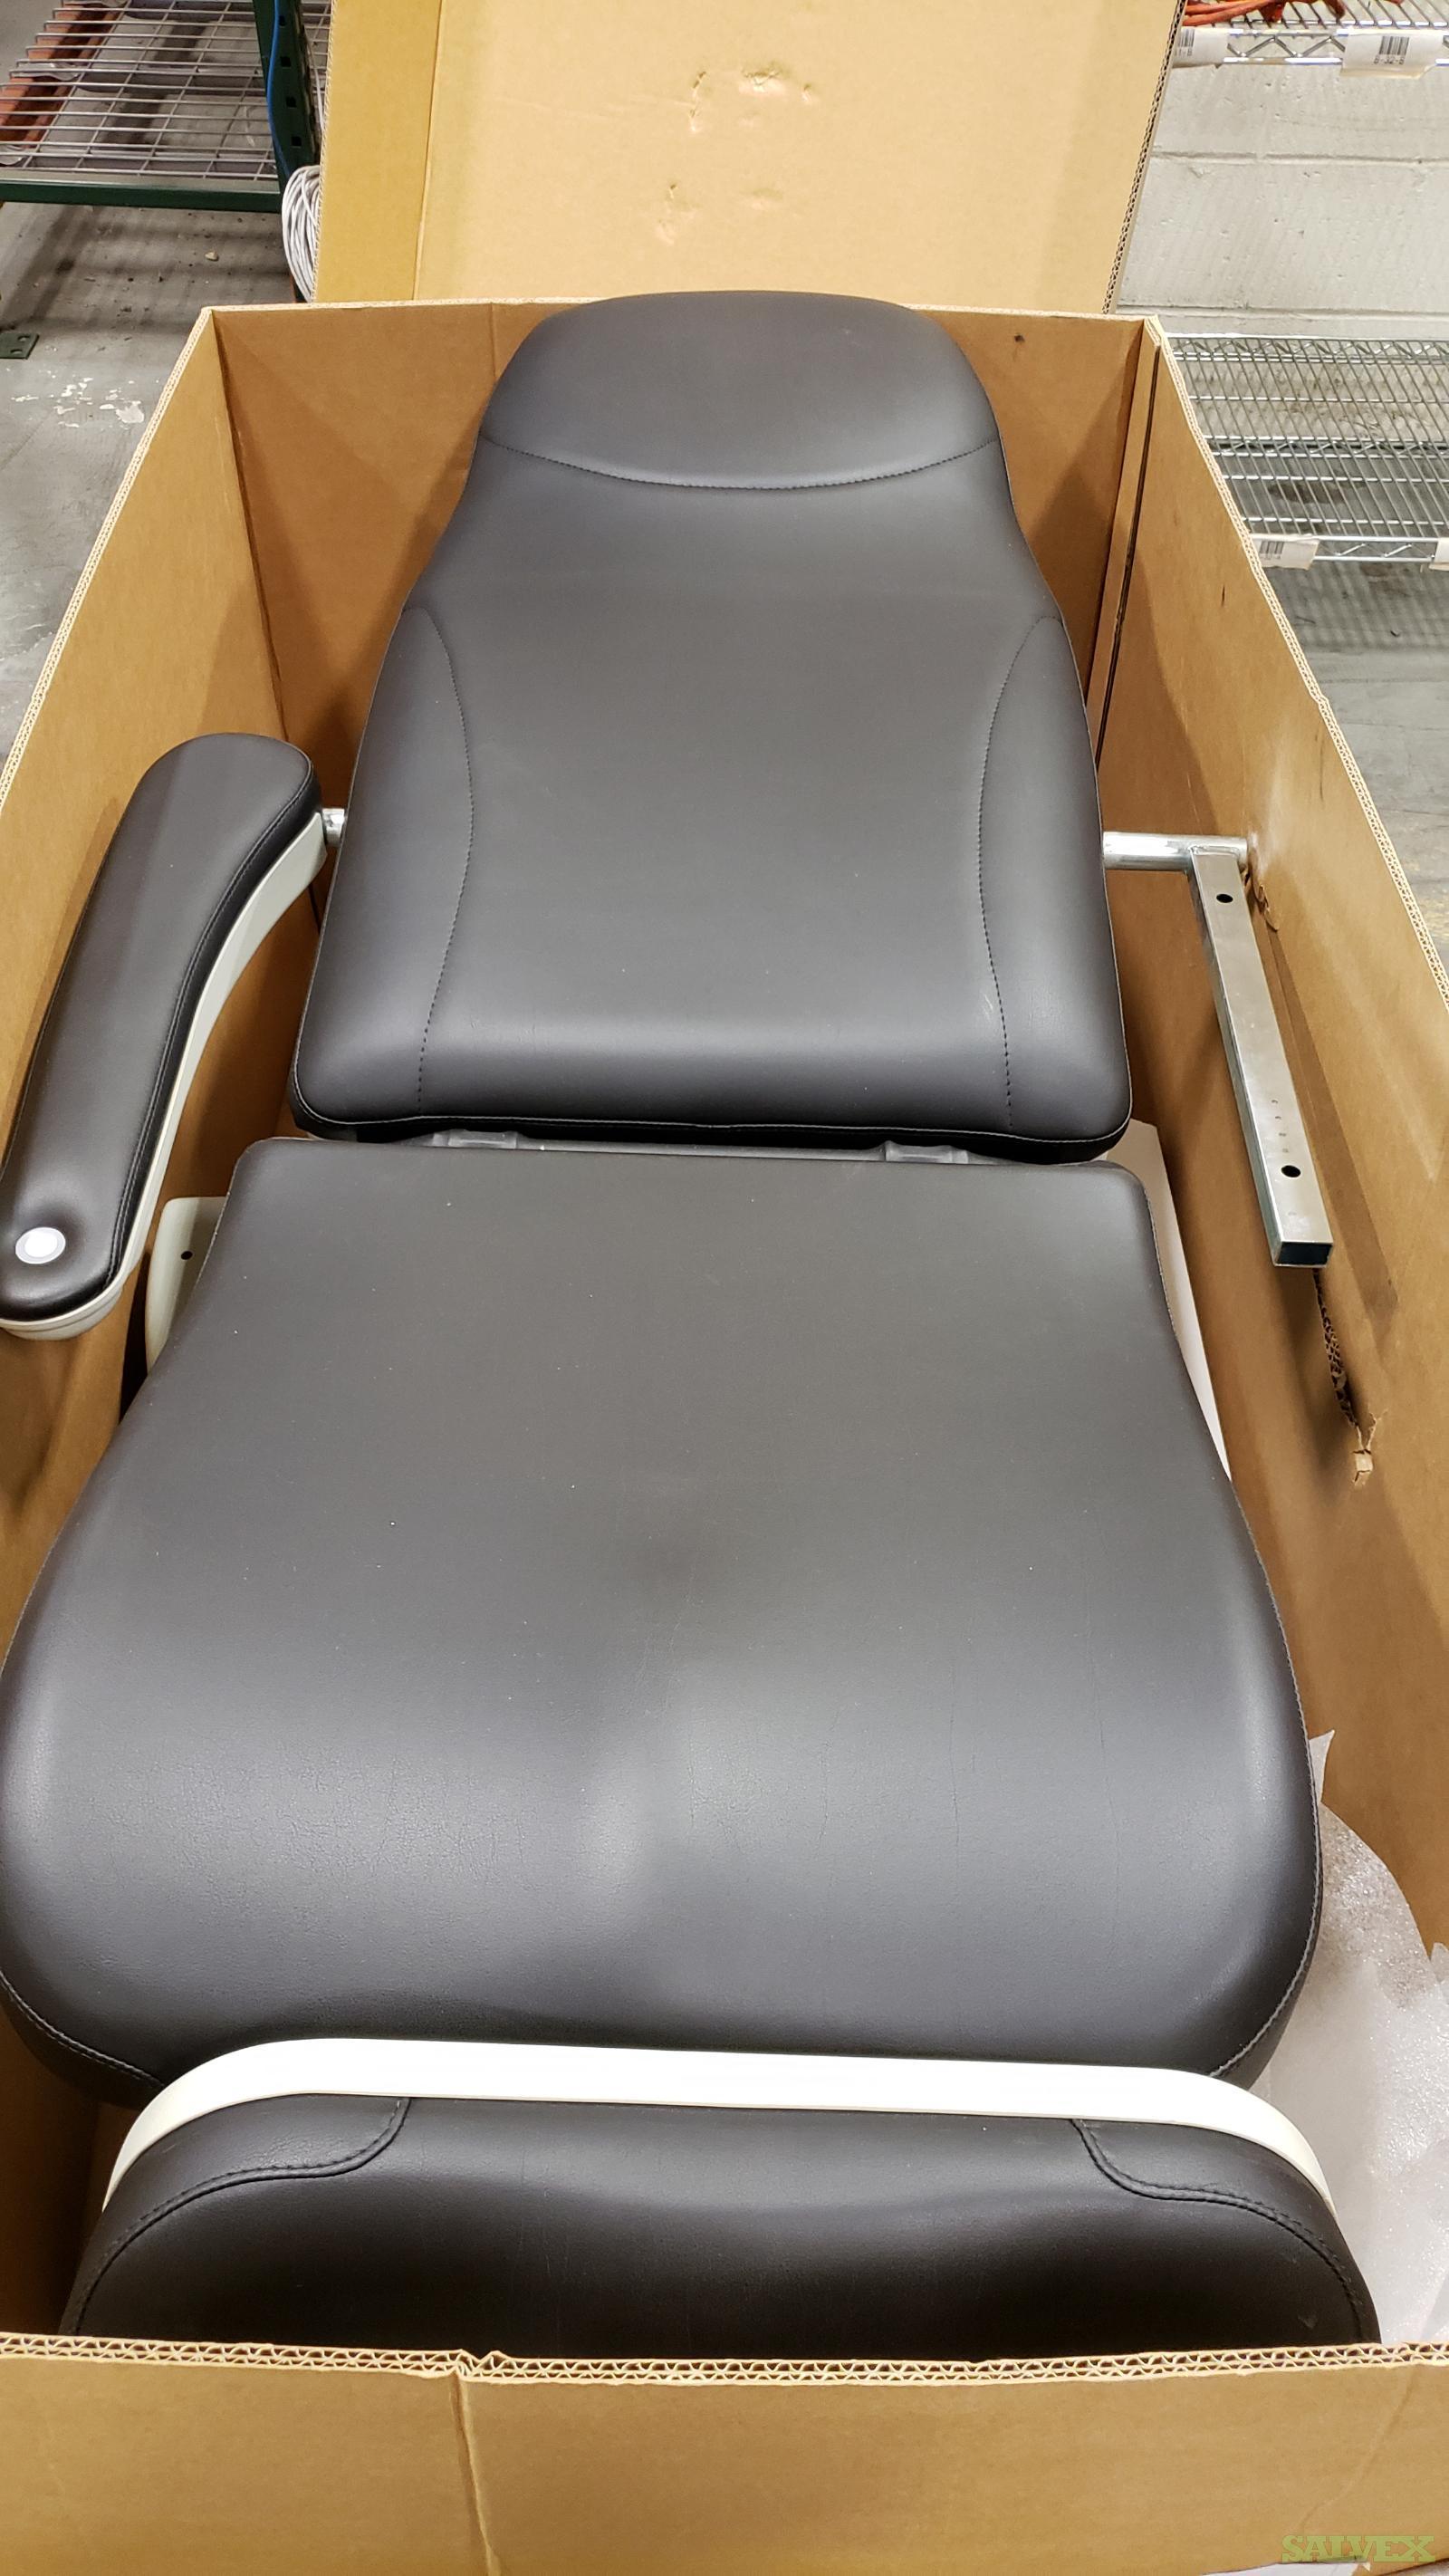 Bentlon Podo Platinum Podiatry Chairs - New (3 Units)